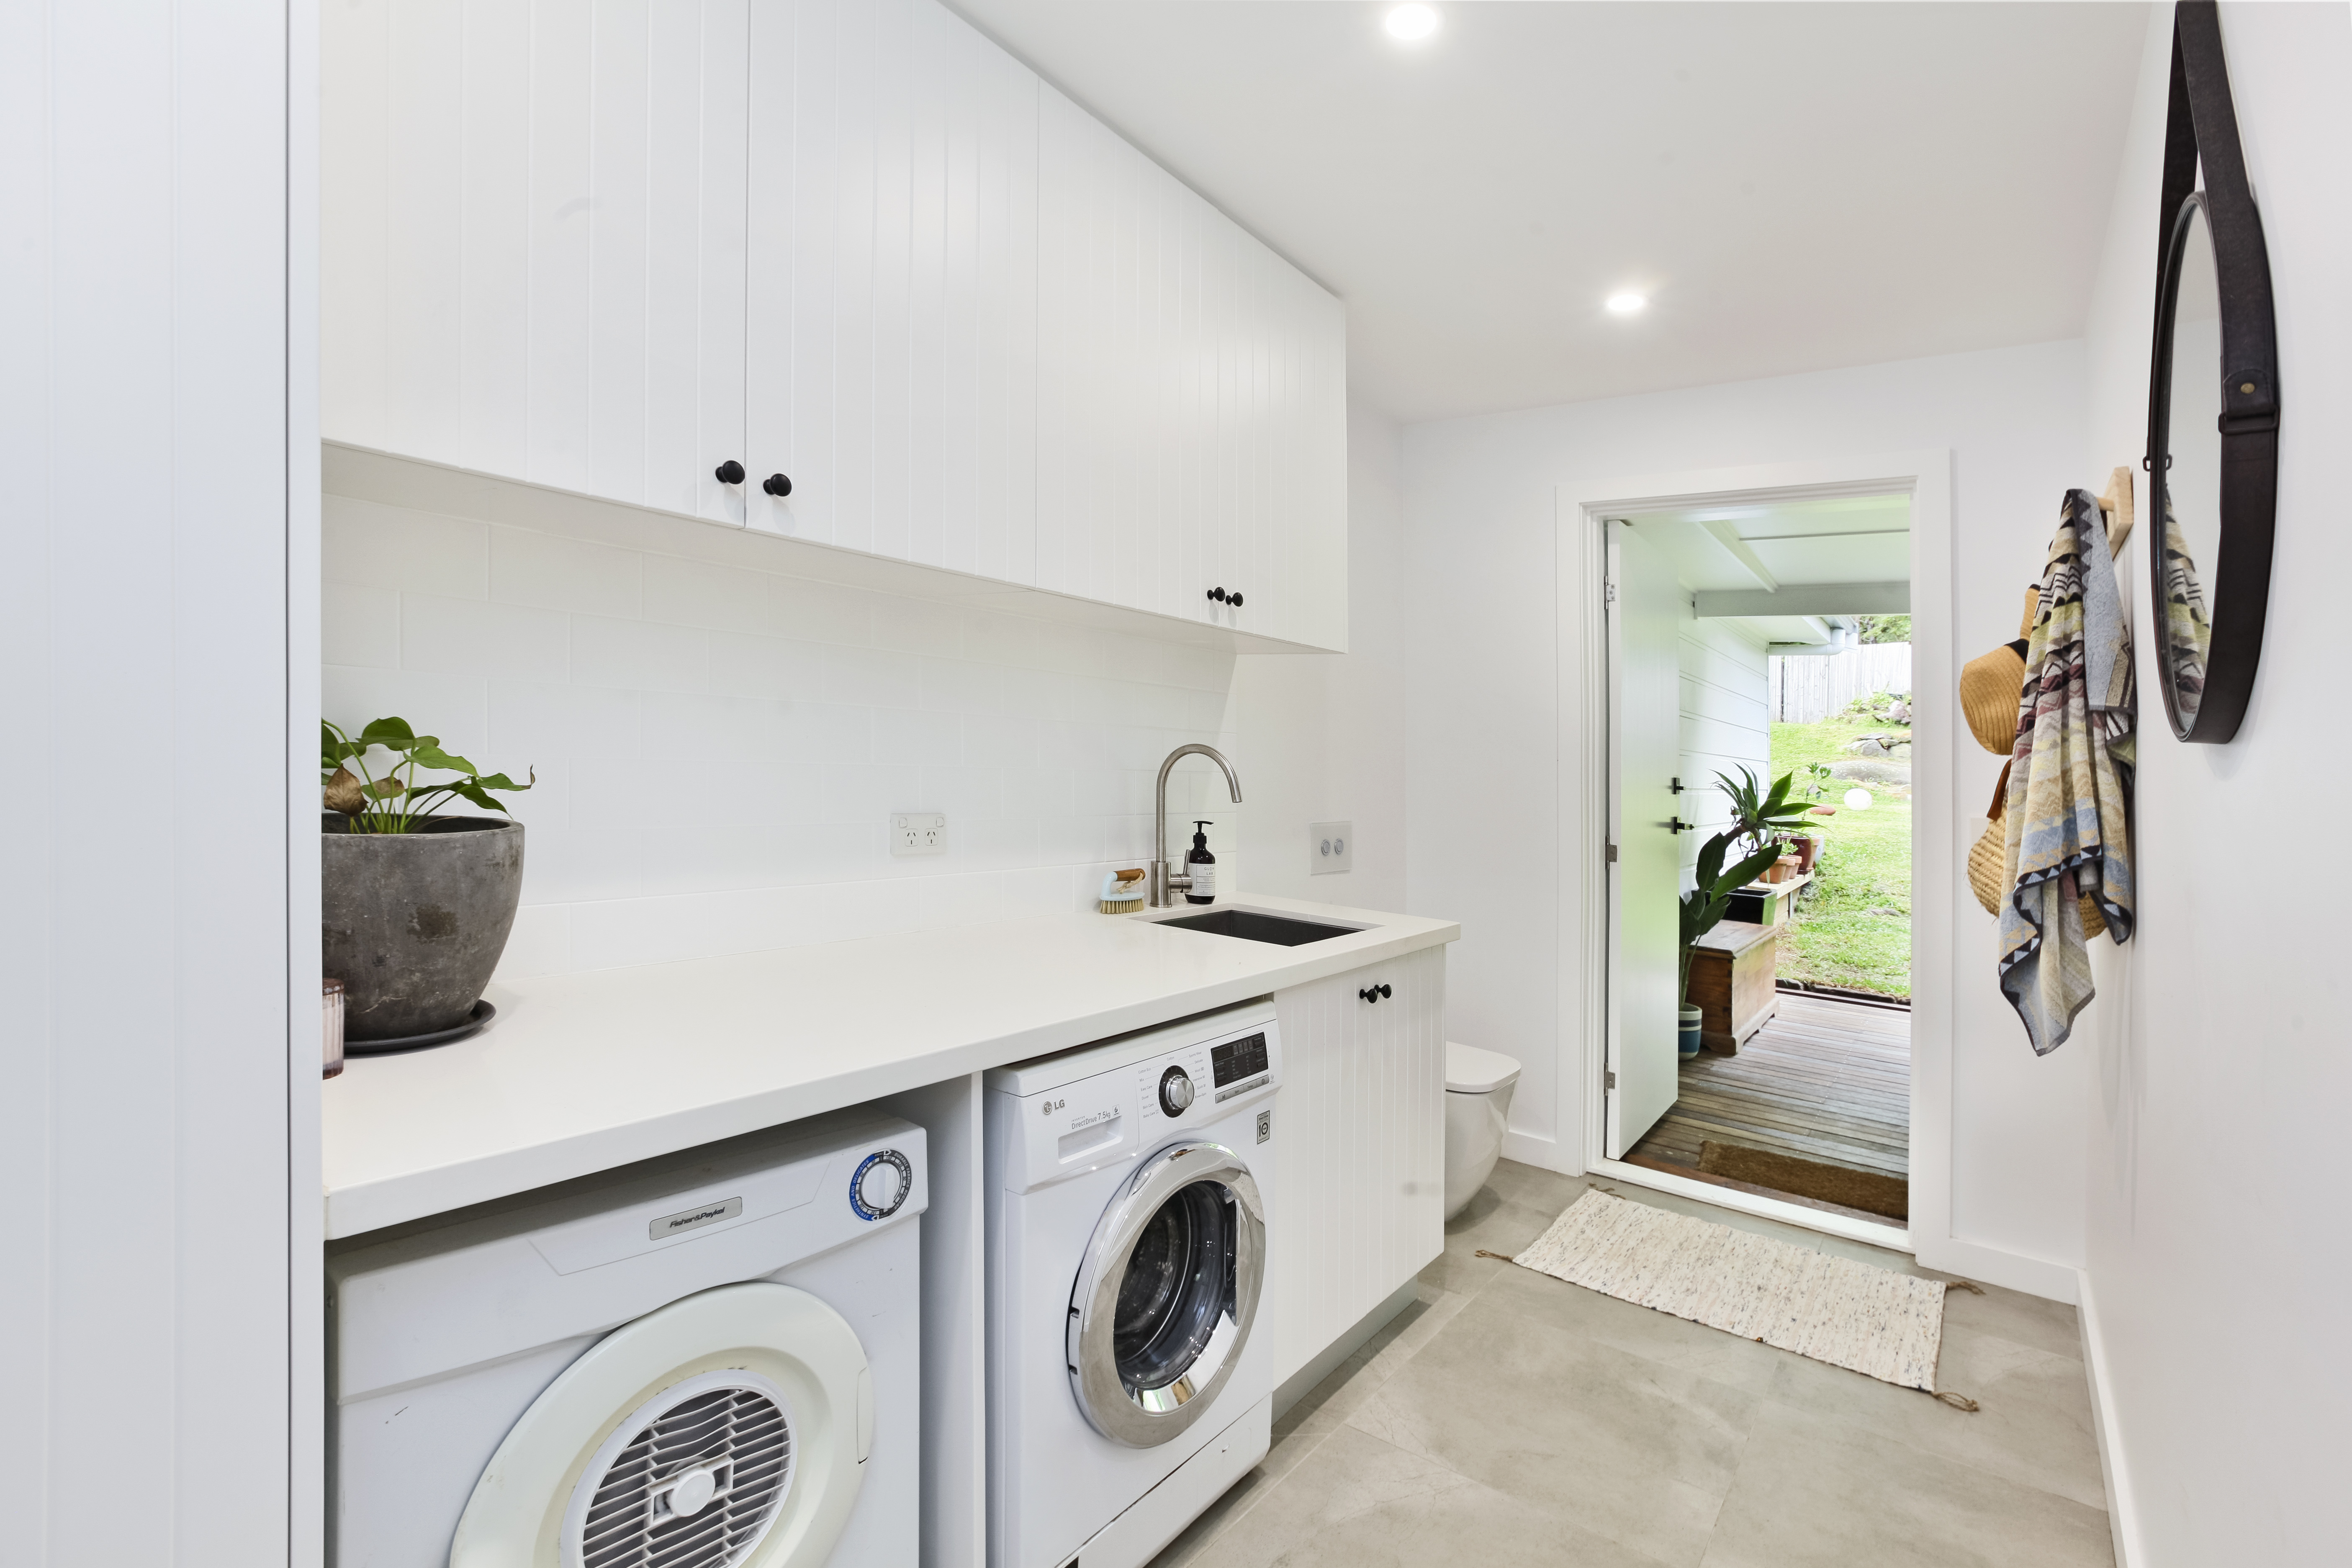 Sorlie-Rd-34-FrenchsForest-Laundry